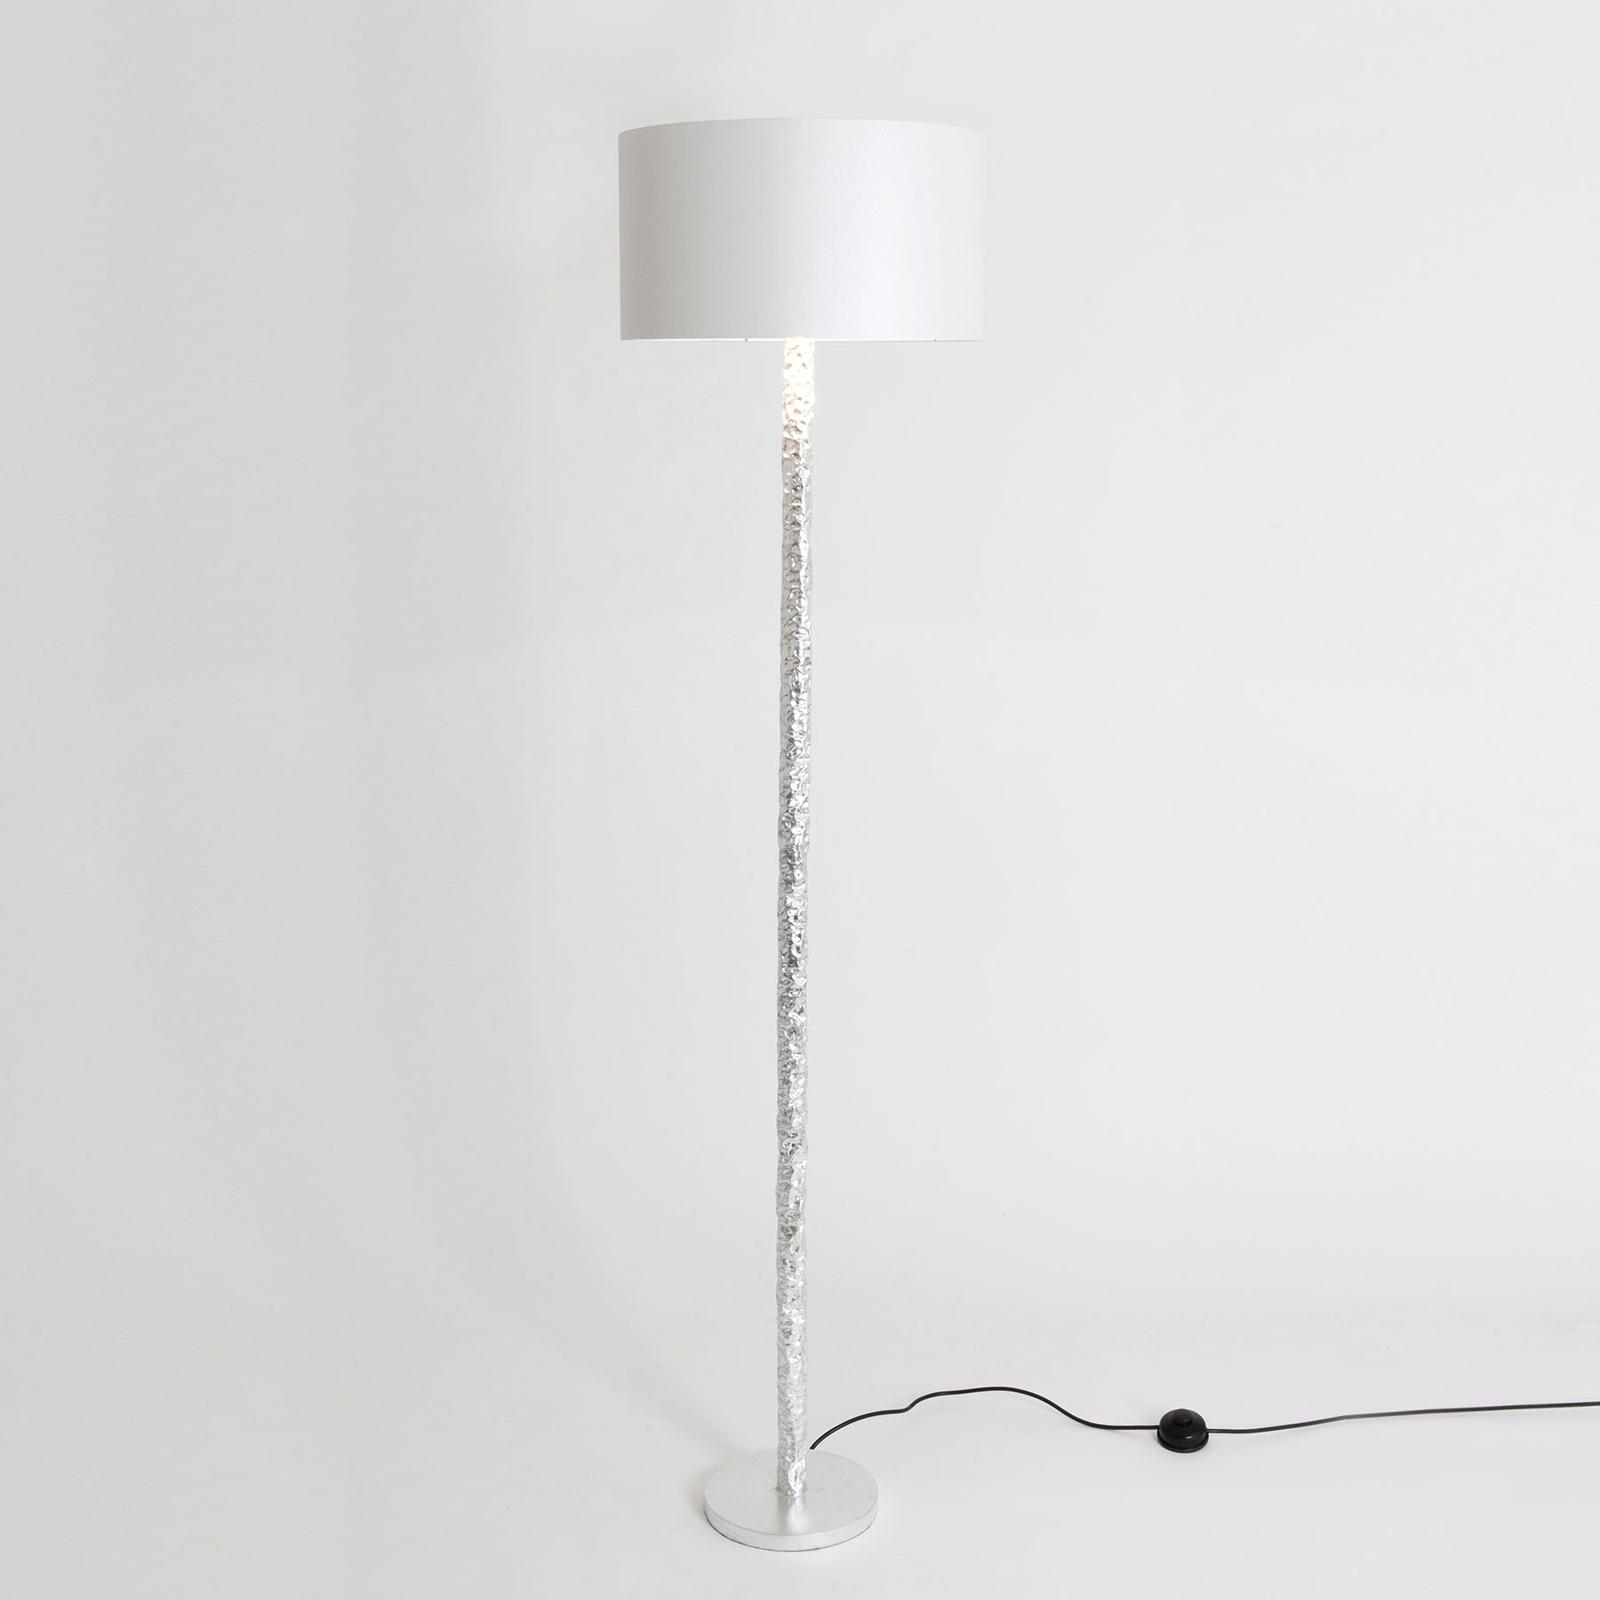 Vloerlamp Cancelliere Rotonda zijde wit/zilver